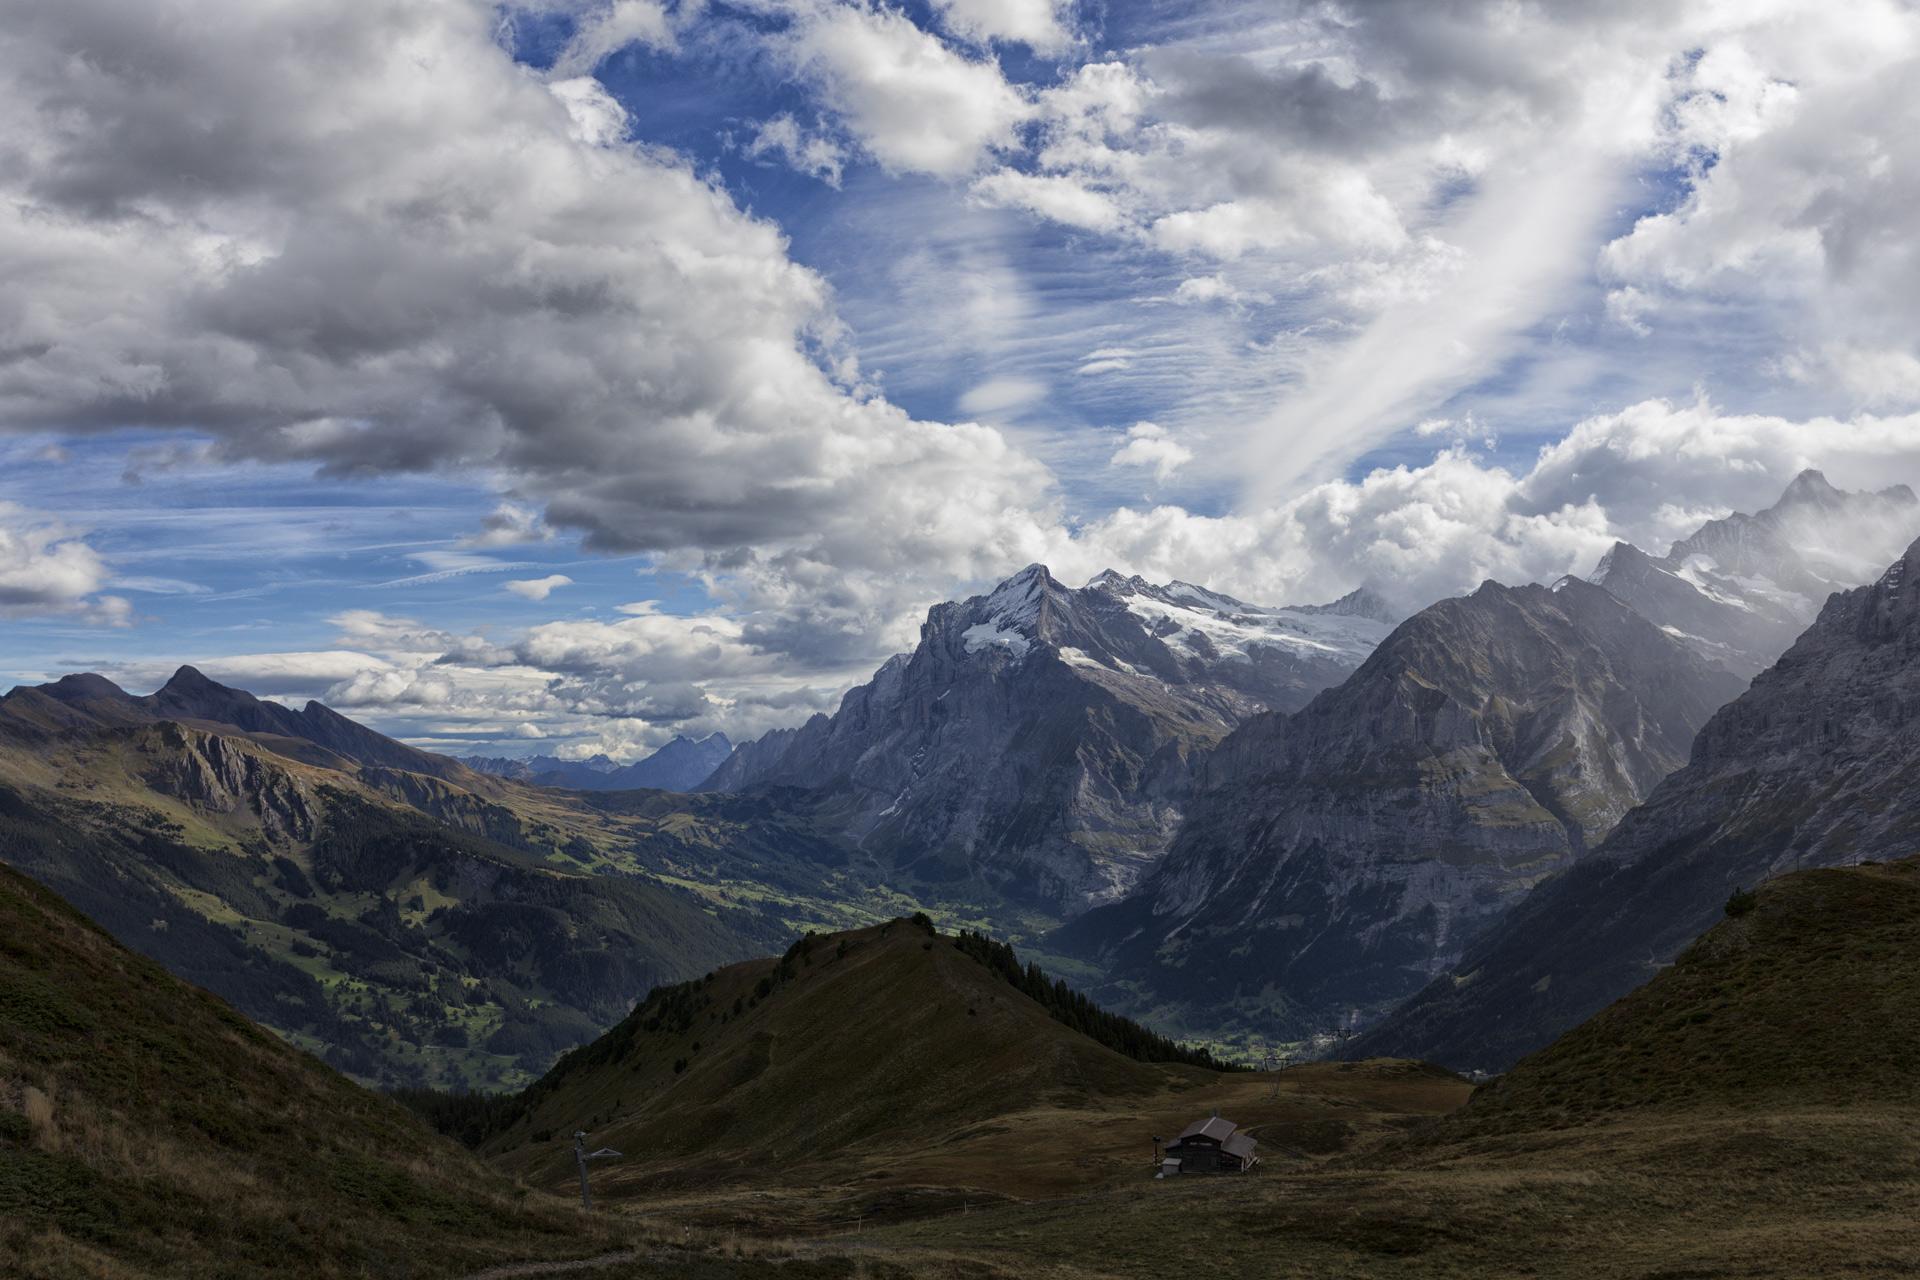 Berner-Oberland_20150916_0036-1